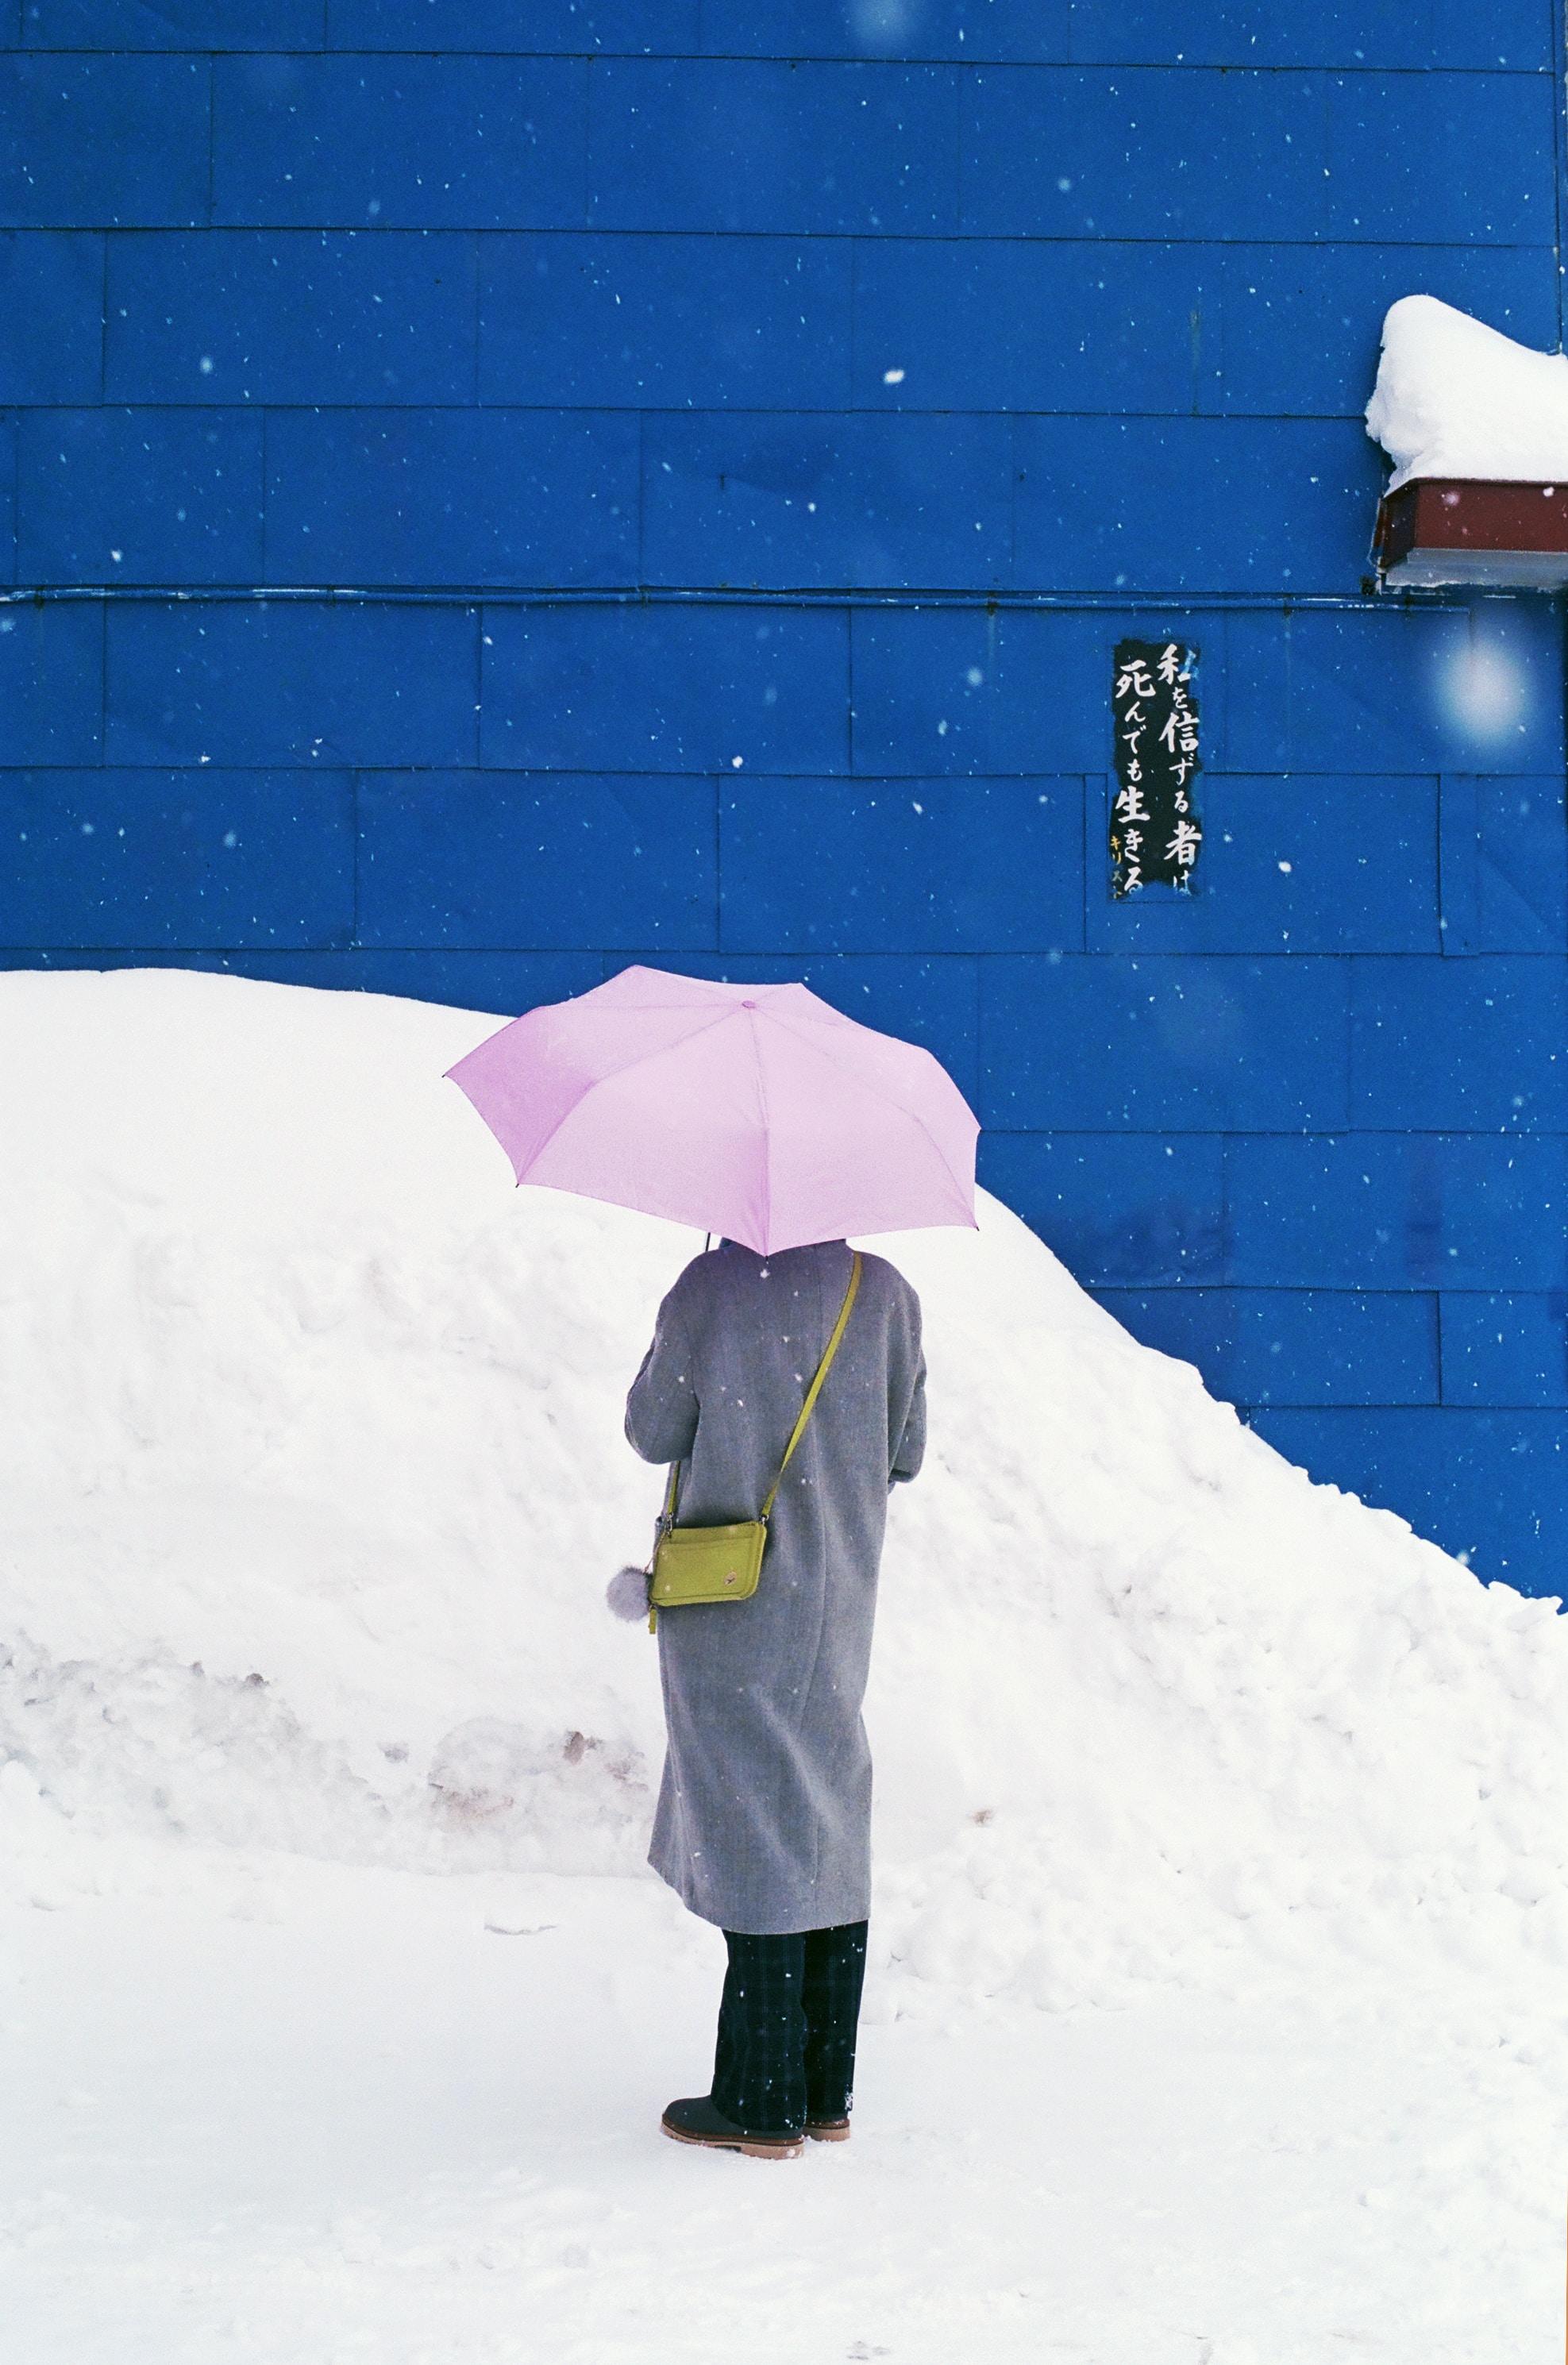 Feeling Blue? Blue Monday, Winter Blues & More